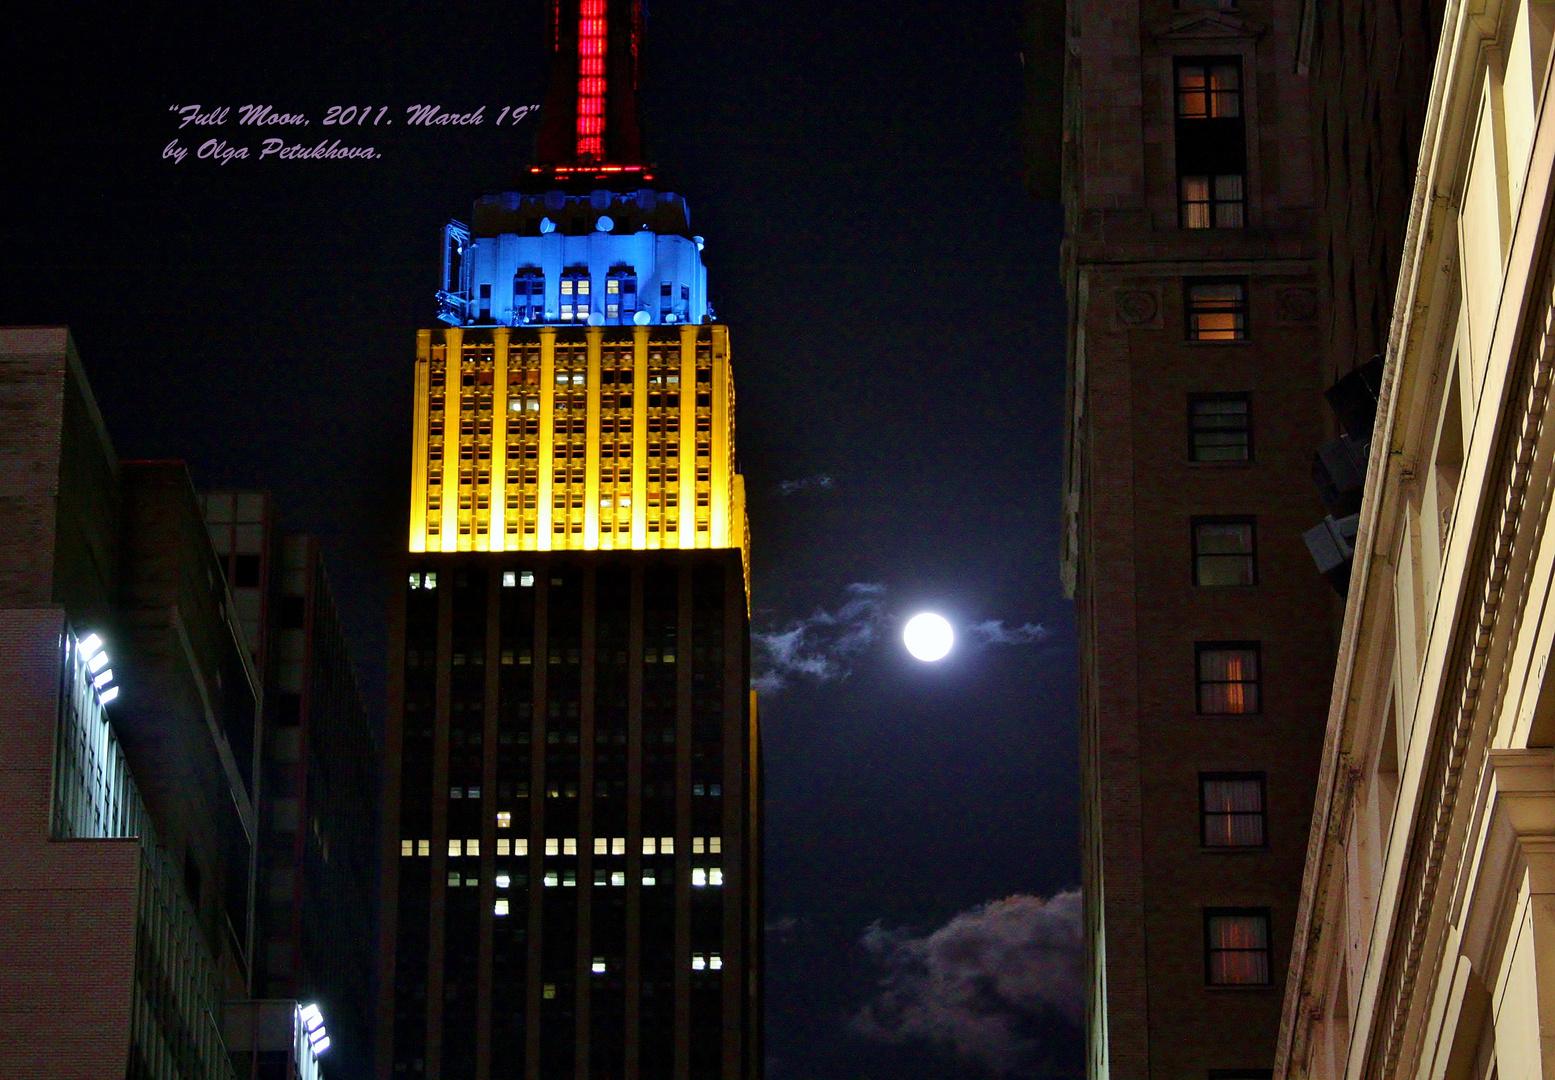 Full Moon, 2011, March 19.